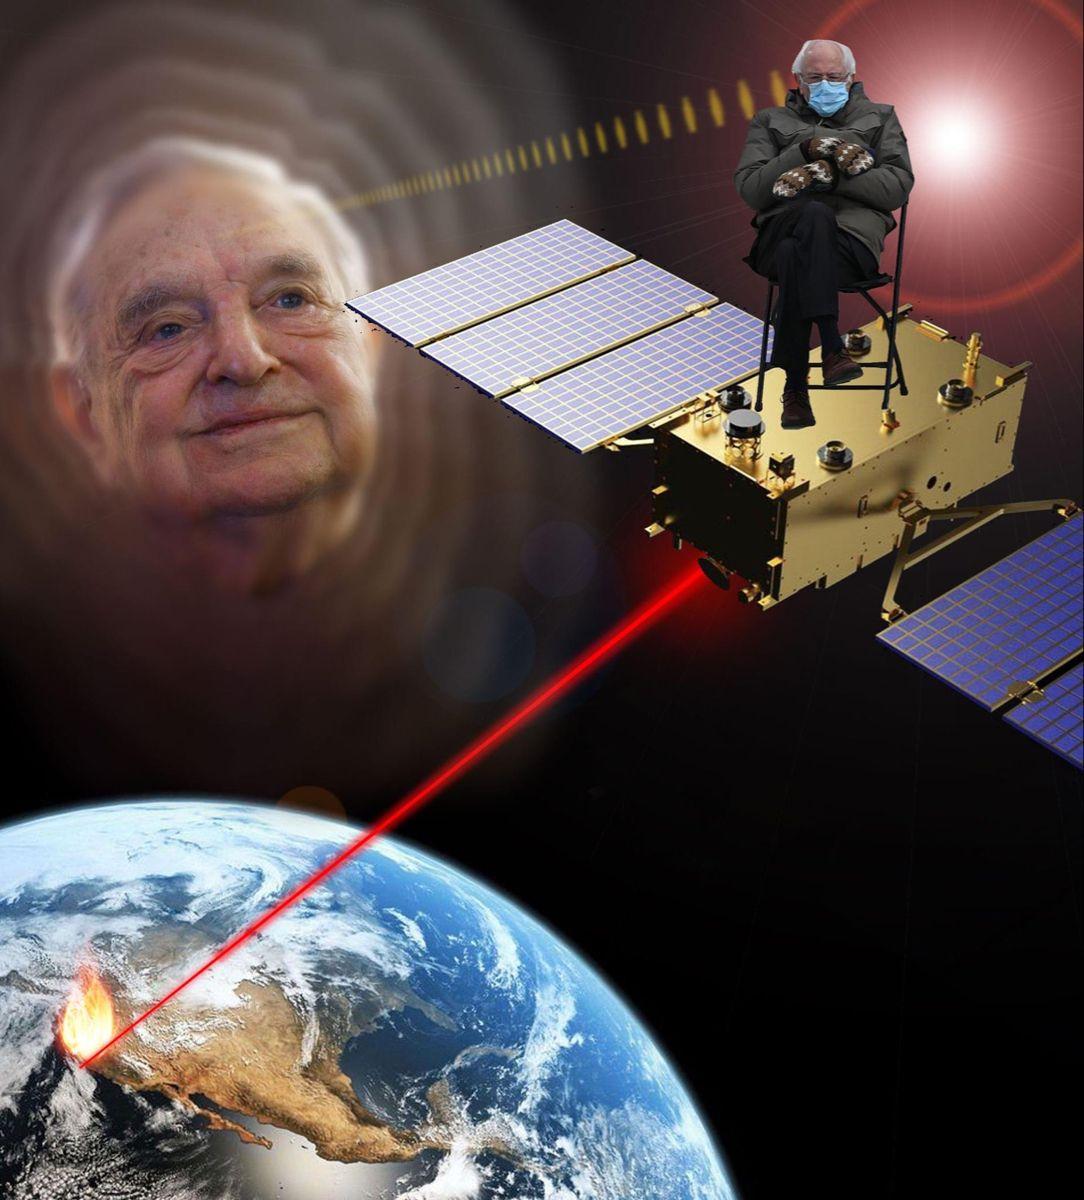 Pin By Elana Roston On Bernie 2021 Inauguration Meme In 2021 Sci Fi Inauguration Sci